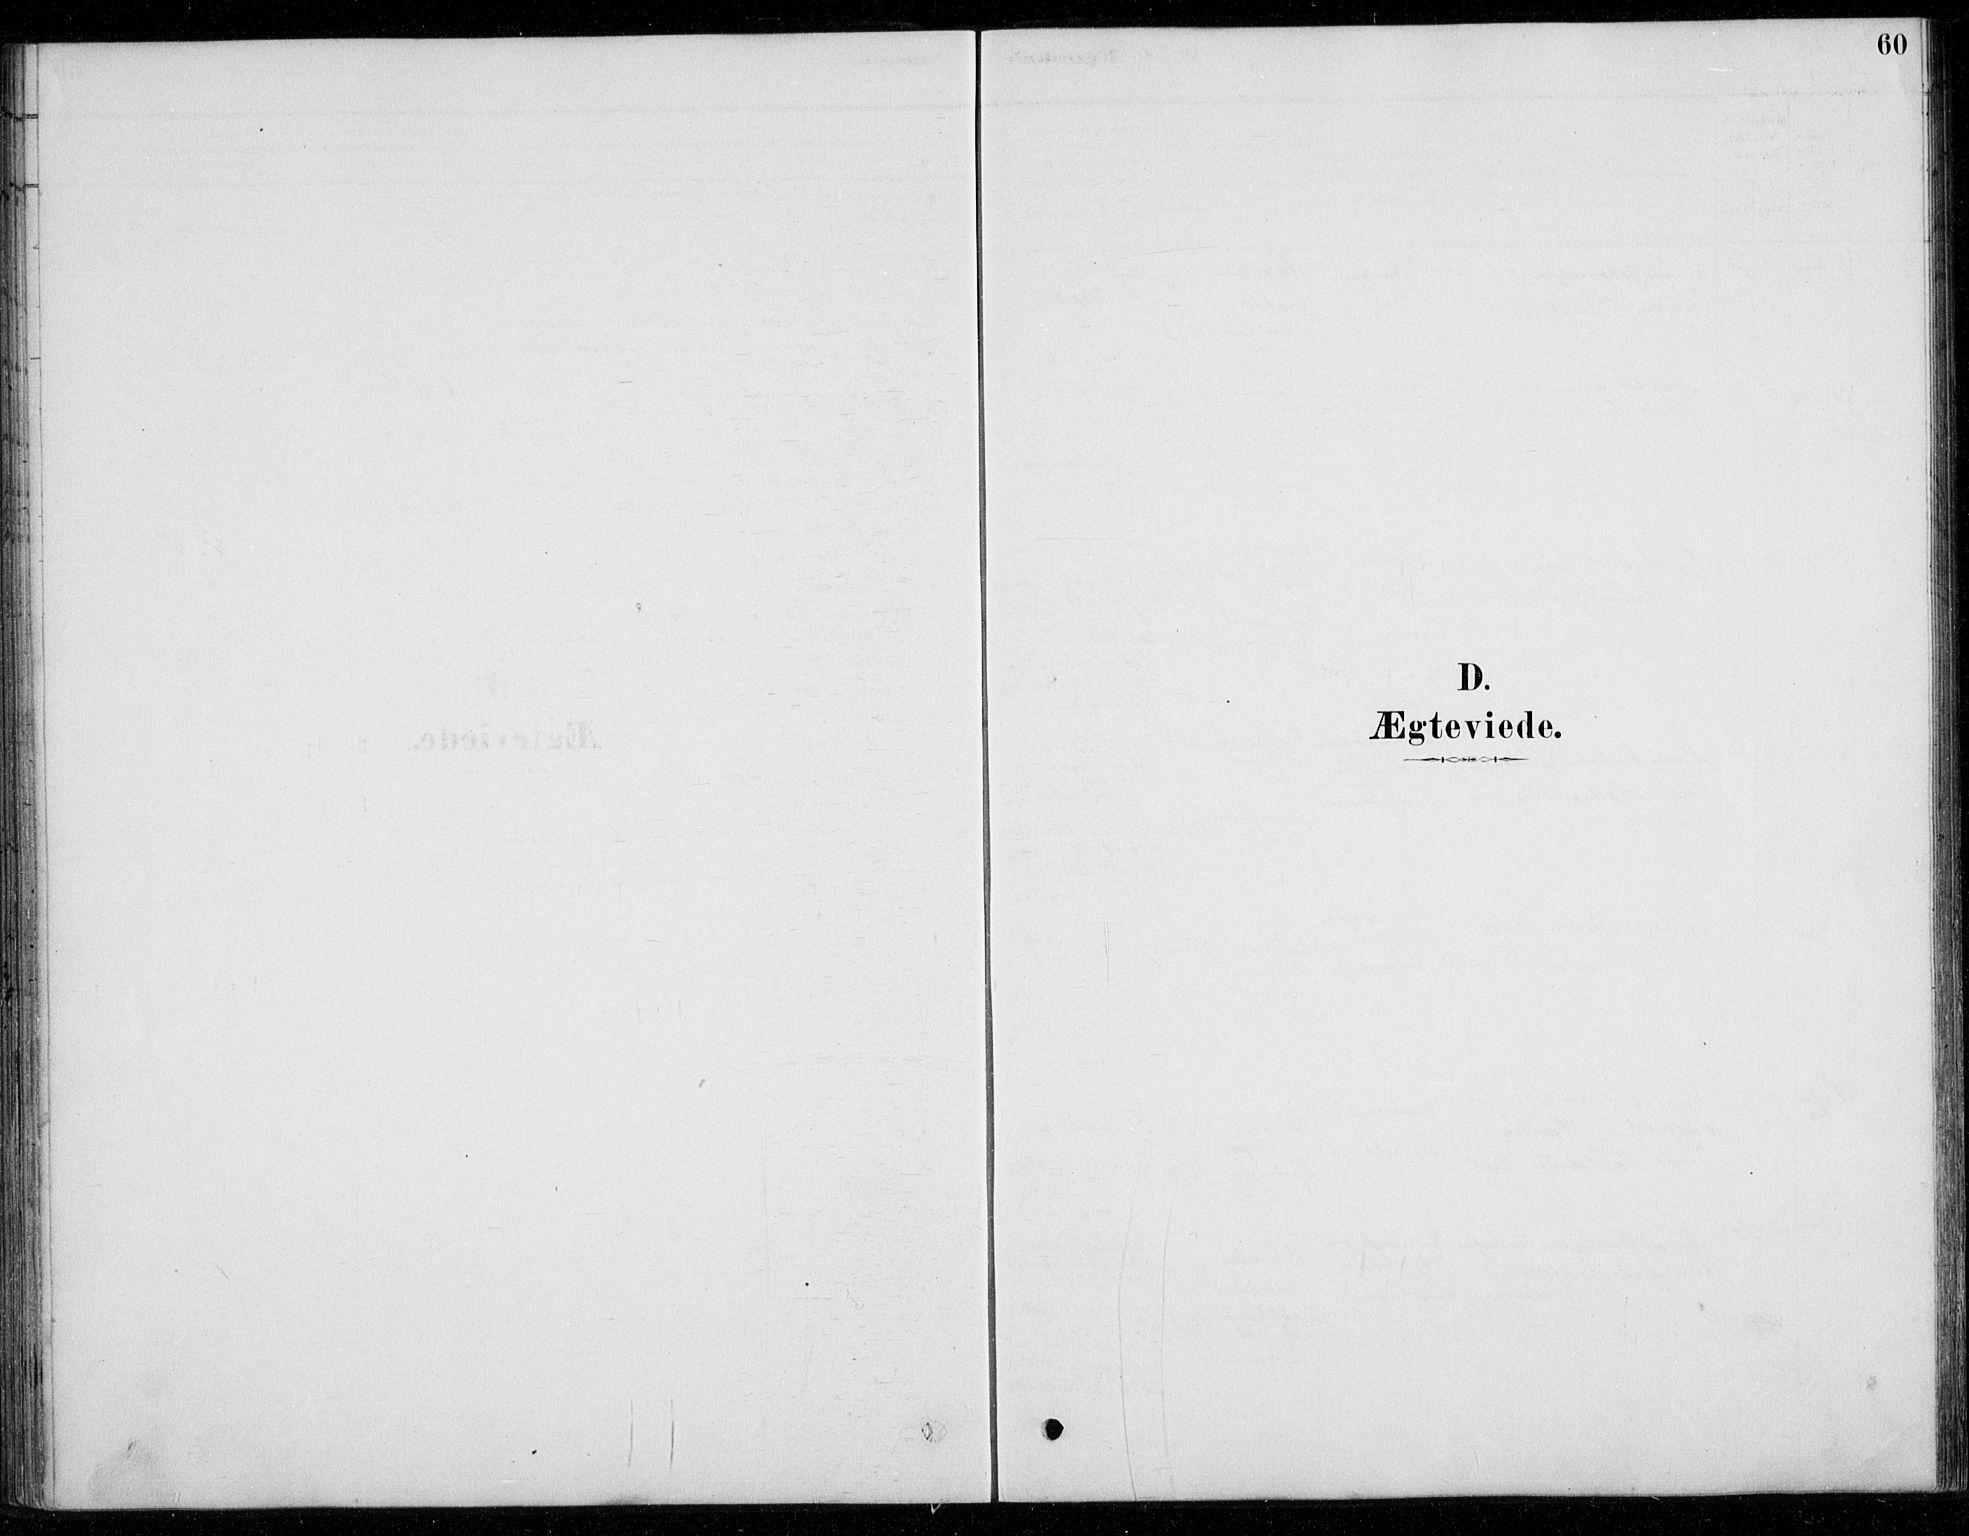 SAO, Fet prestekontor Kirkebøker, G/Gb/L0002: Klokkerbok nr. II 2, 1878-1911, s. 60